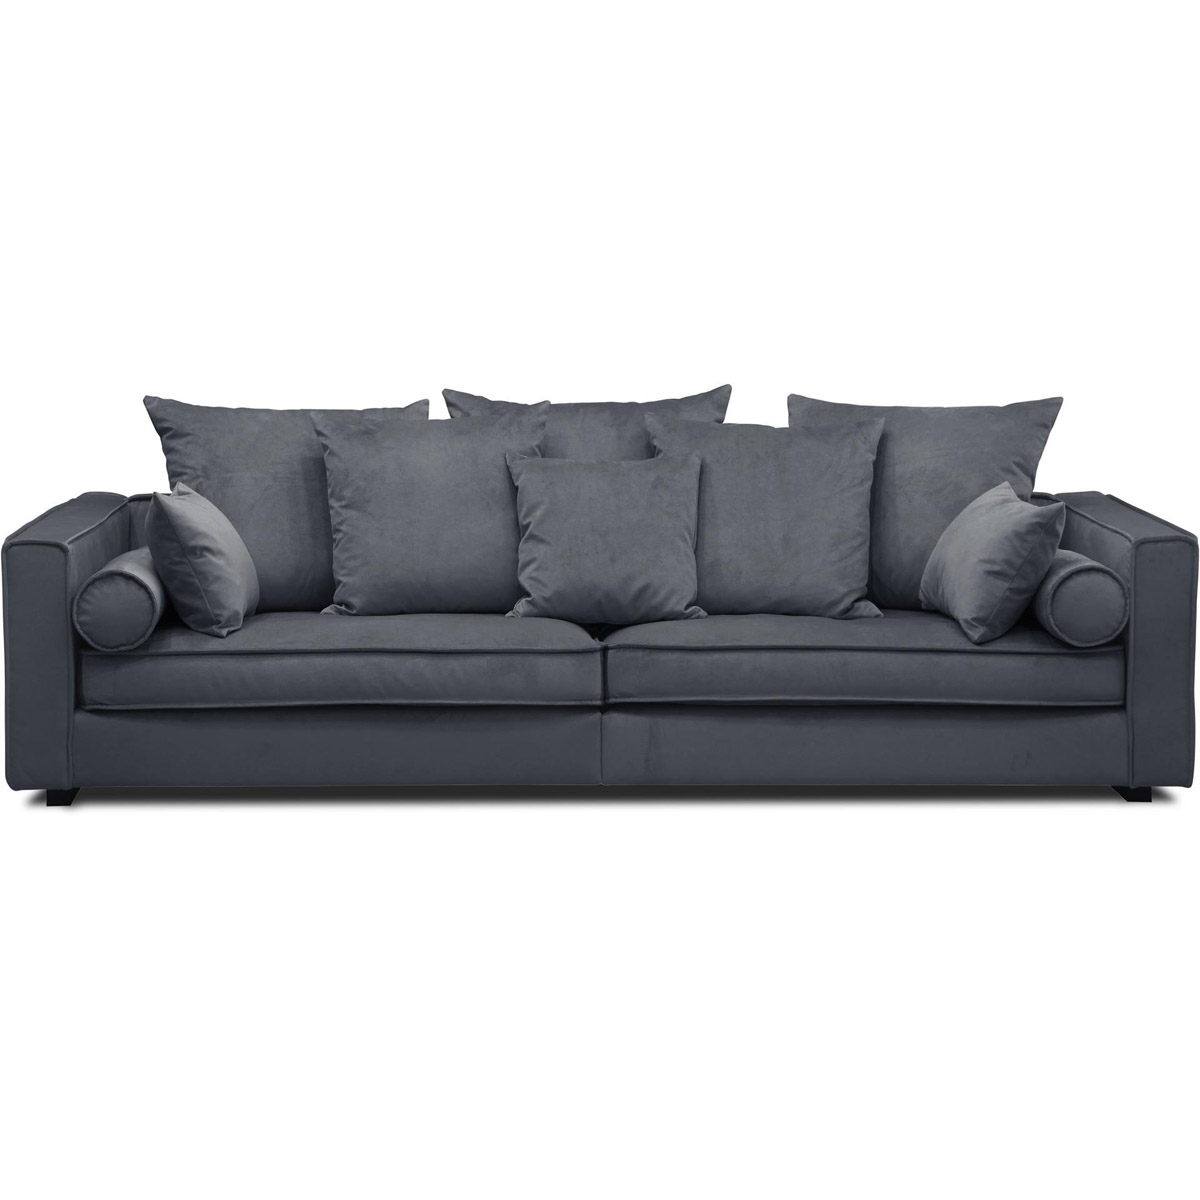 Luca-stor-soffa-3,5-sits-tyg-grå